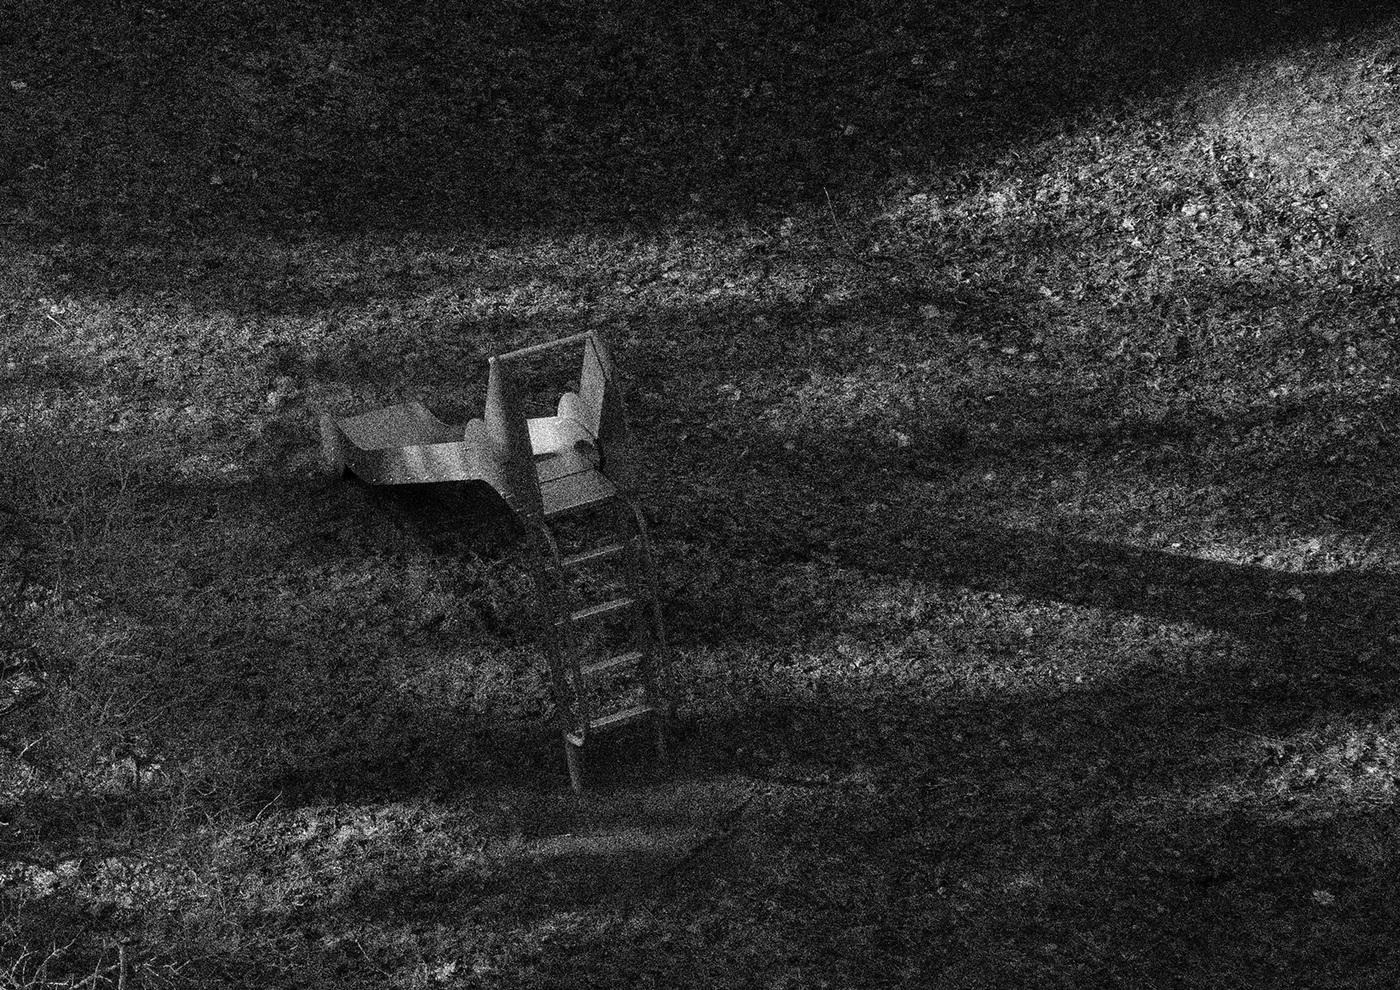 protasiuk - The Narrow Daylight 12